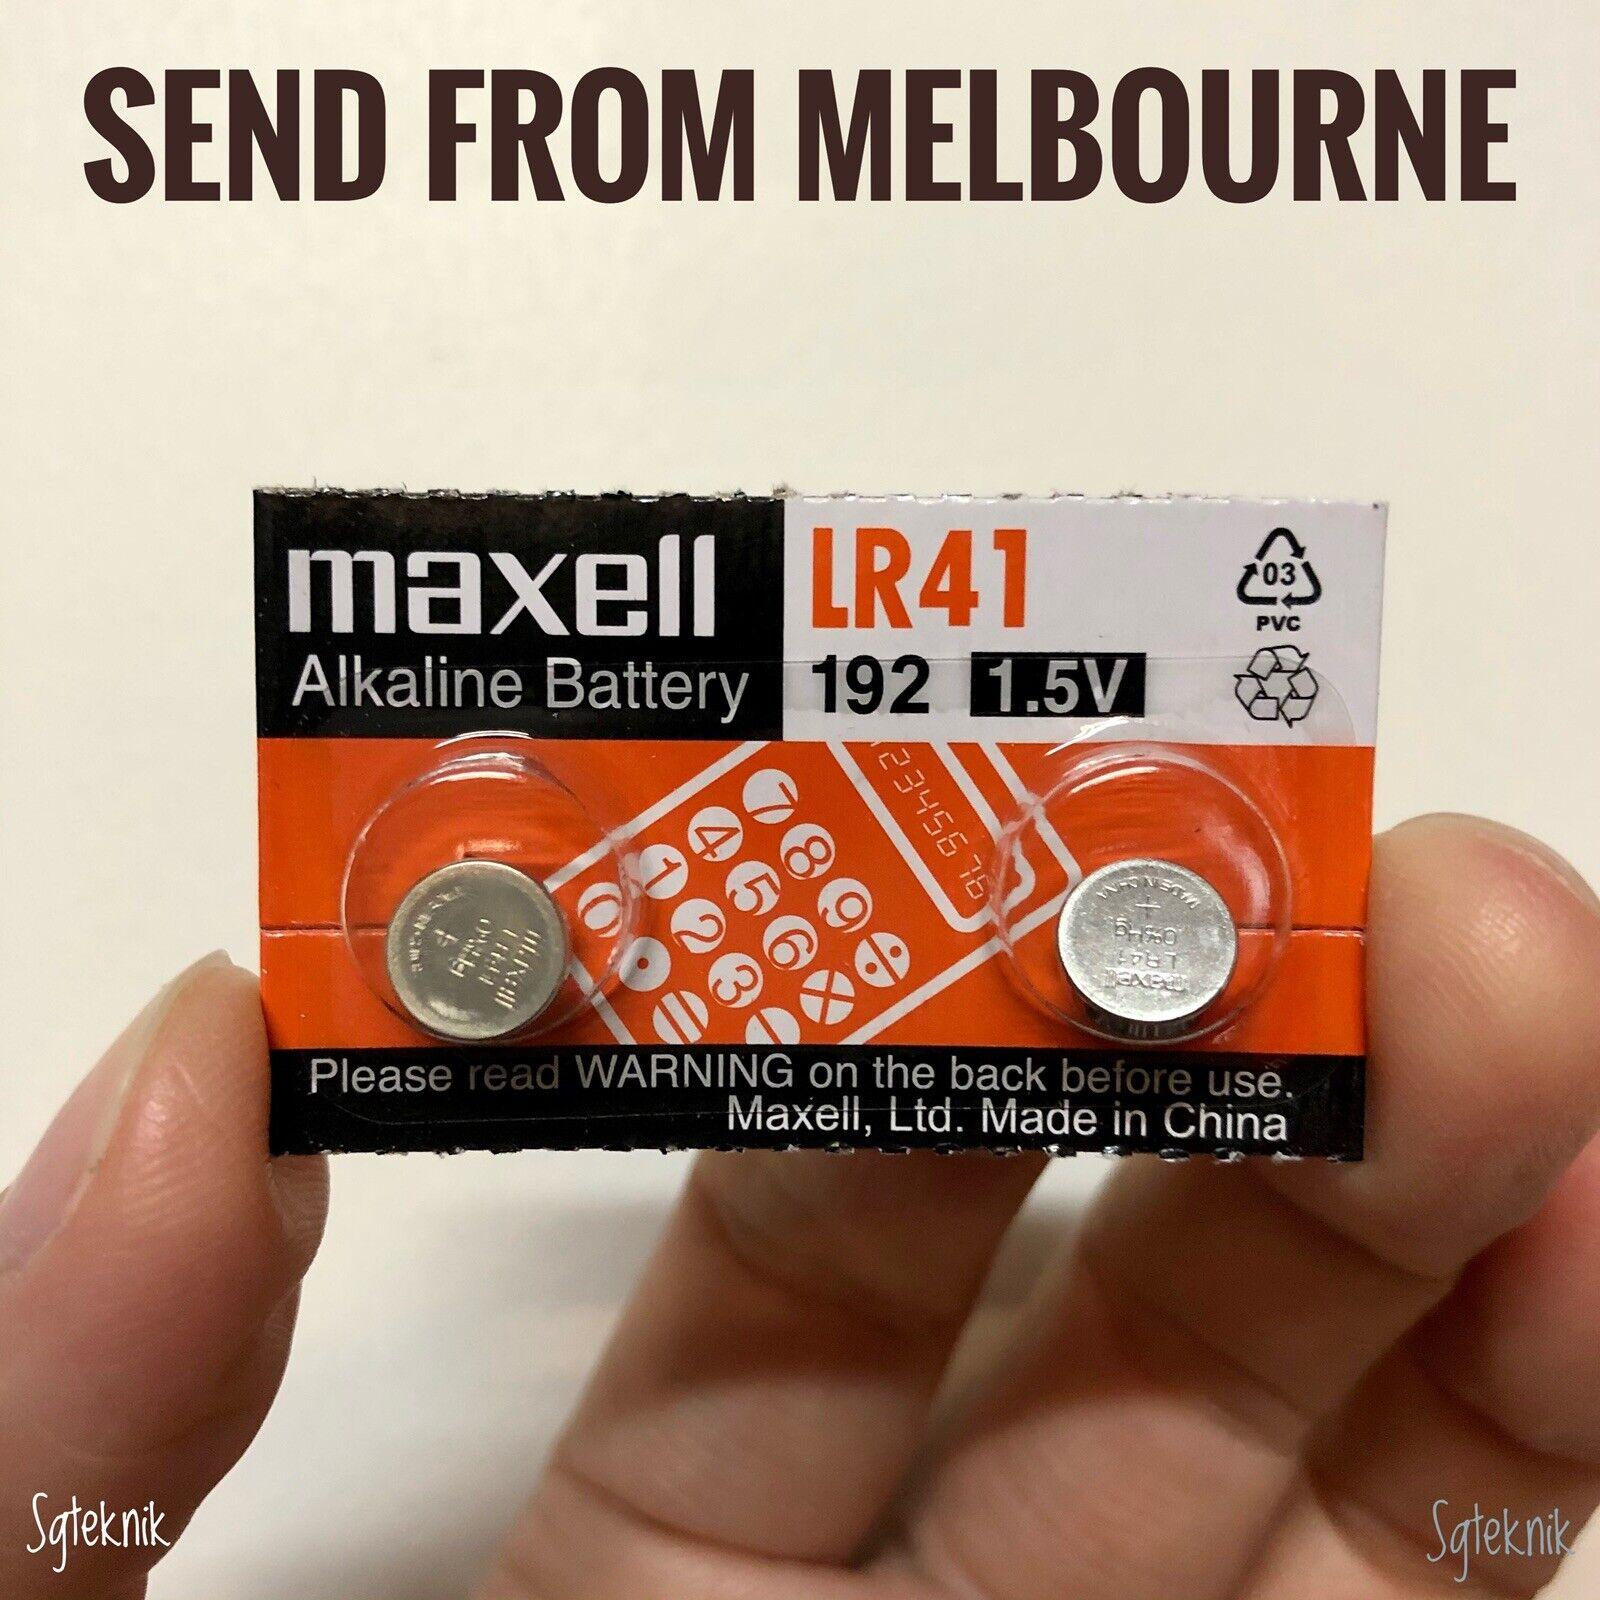 Genuine 2pcs Maxell LR41 Button Battery AG3 392 192 SR41 Alkaline Cell FREE Post